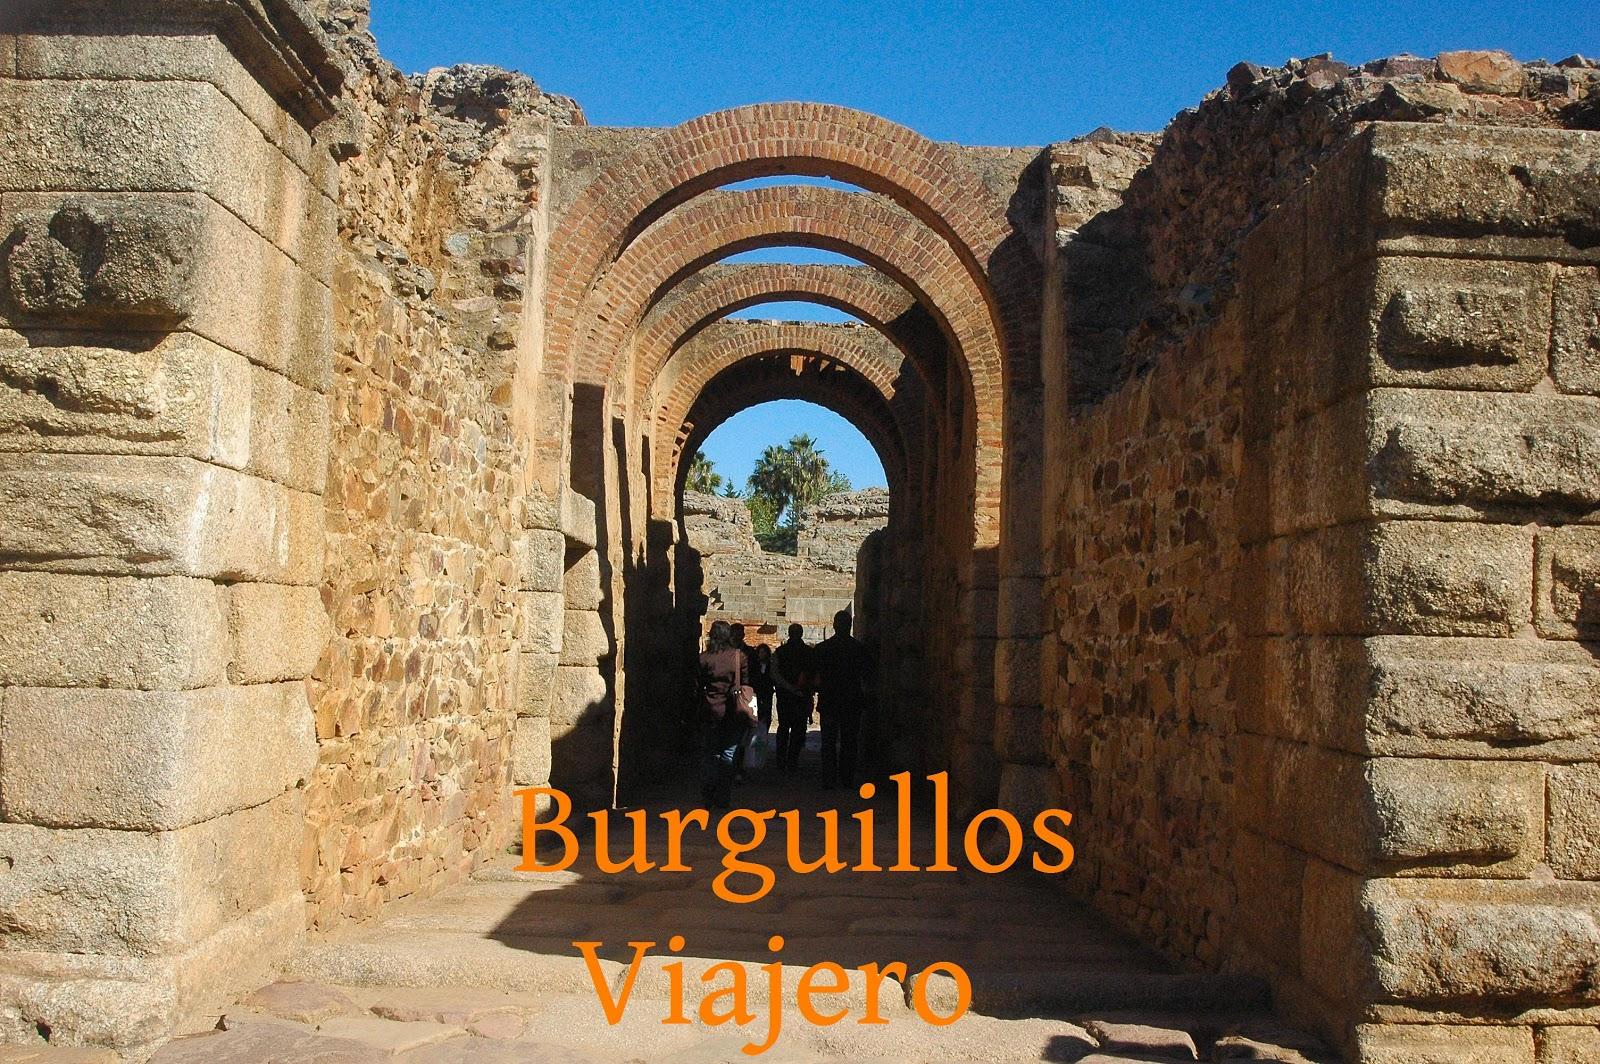 Burguillos Viajero II: 461. MÉRIDA** (I), Badajoz: 1 de noviembre de ...